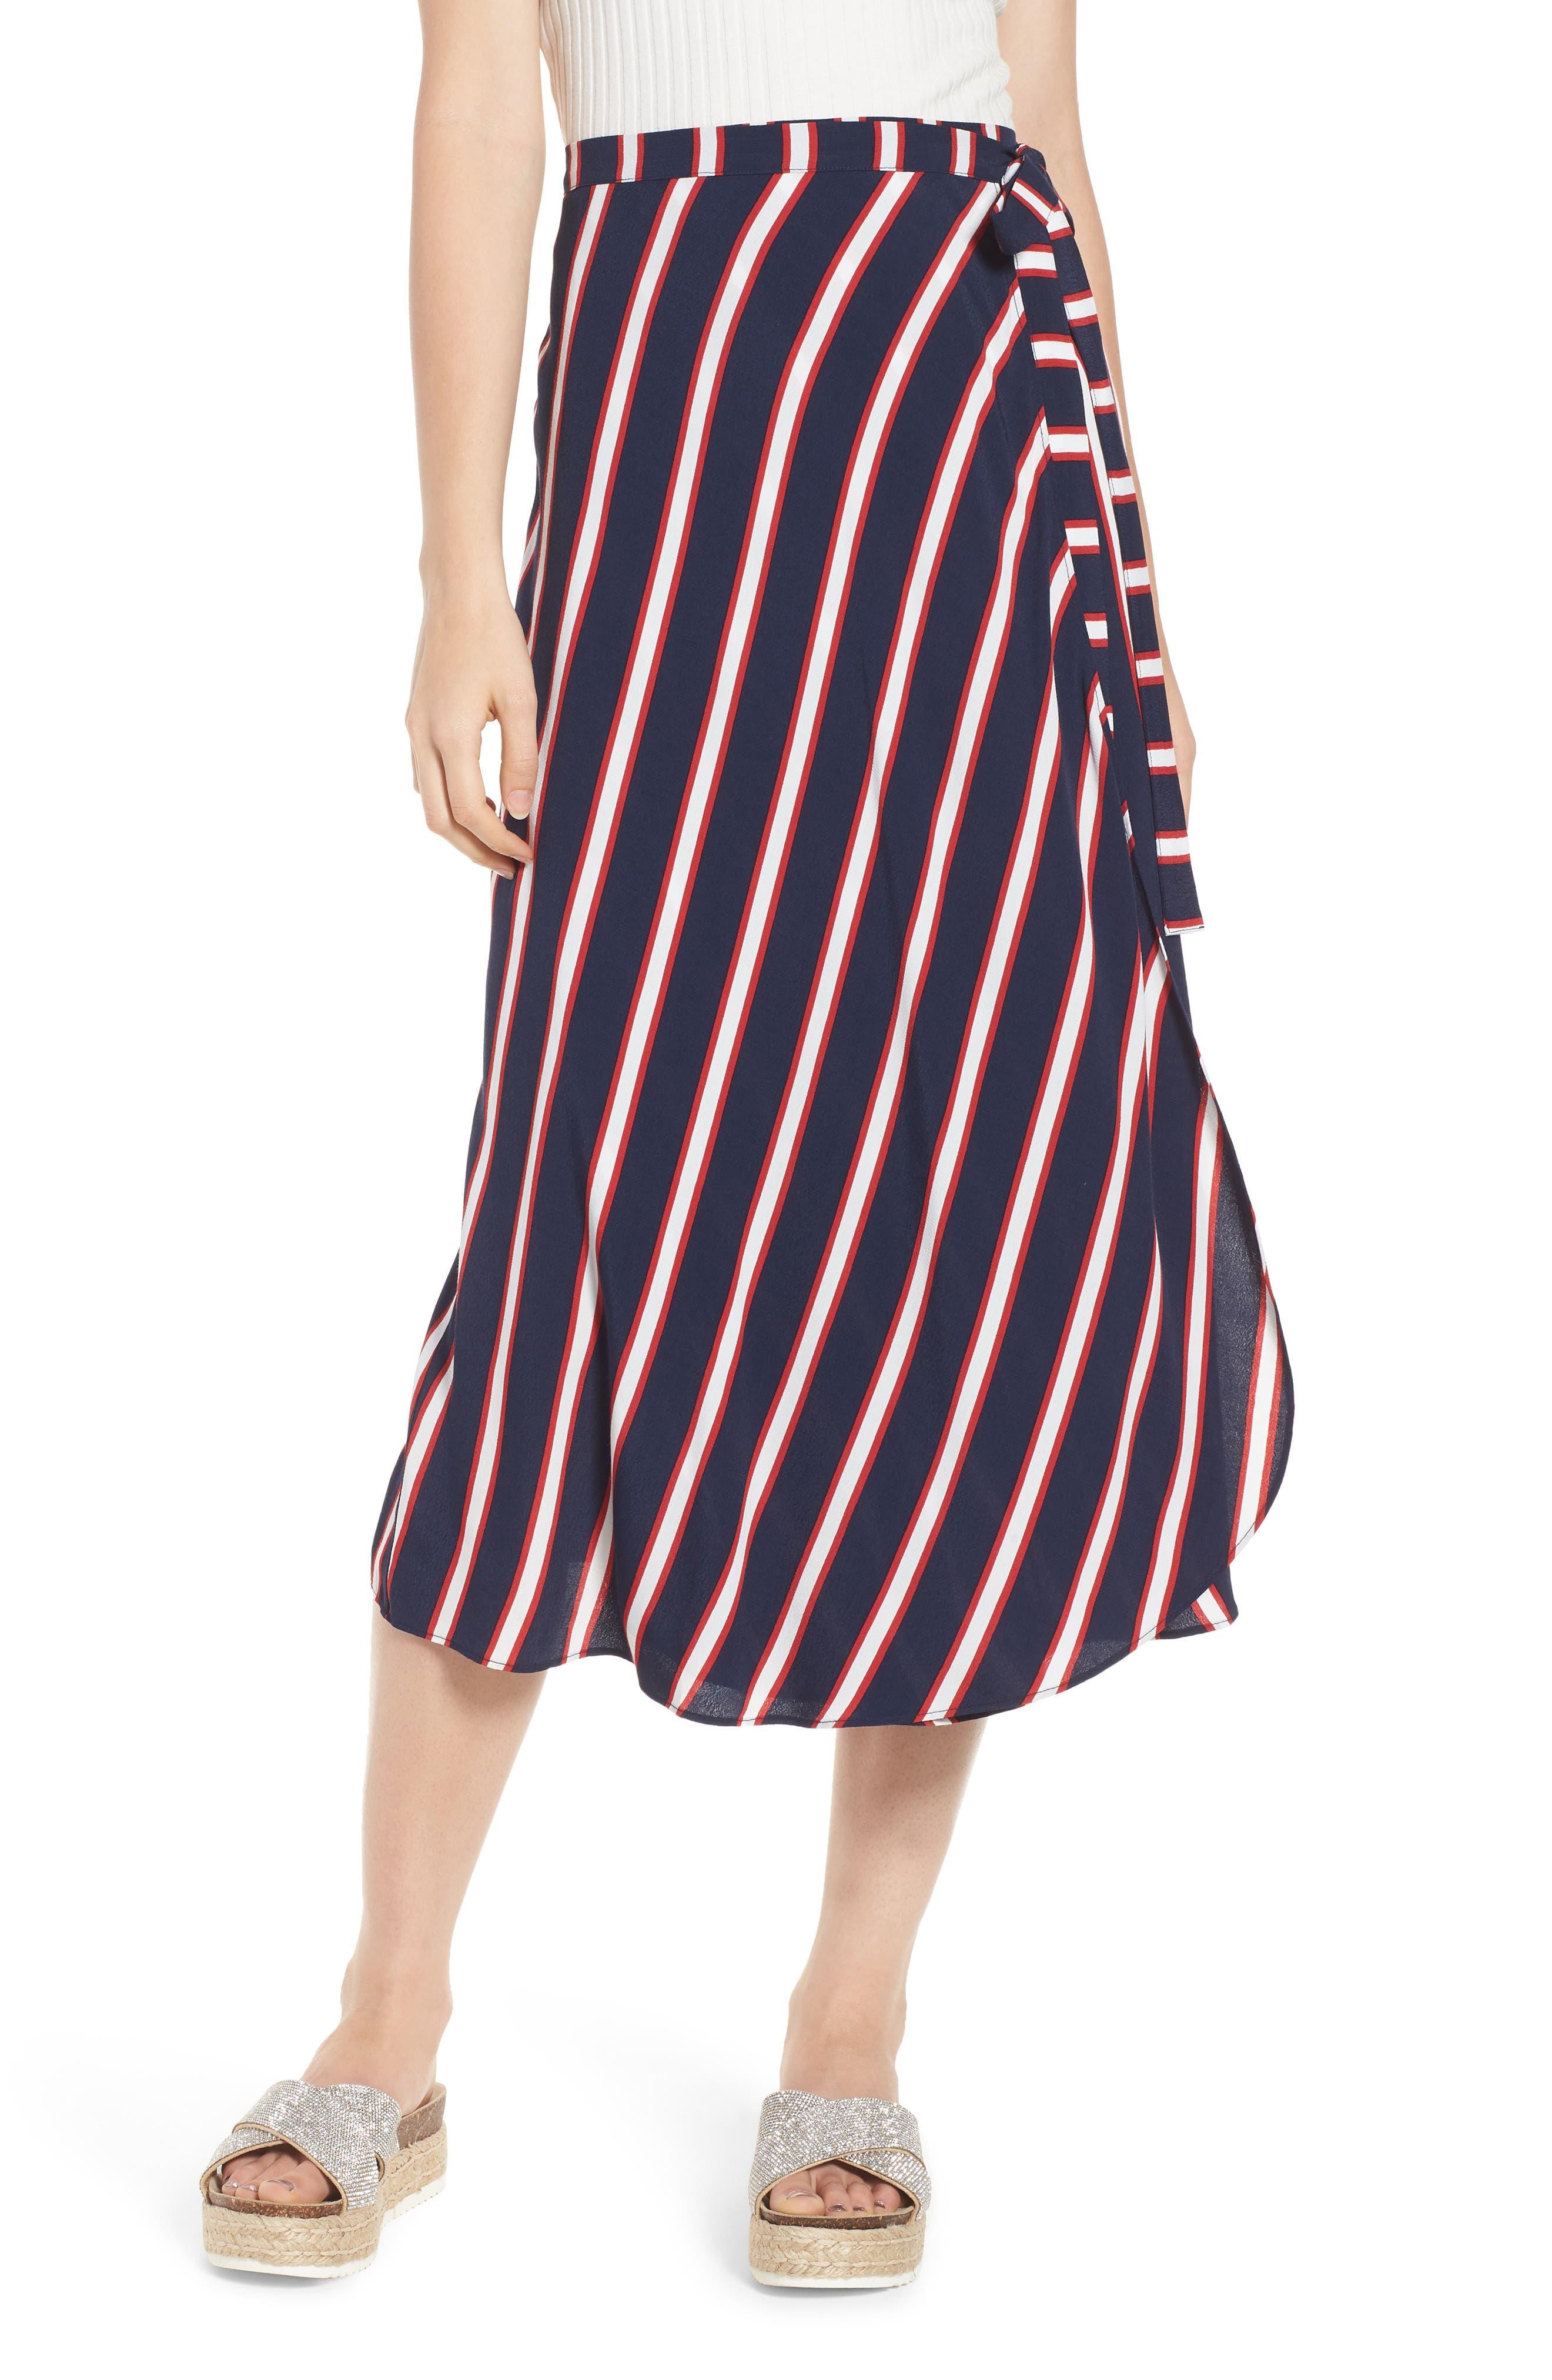 Stripe Midi Wrap Skirt,                             Main thumbnail 1, color,                             Navy Peacoat Awning Stripe